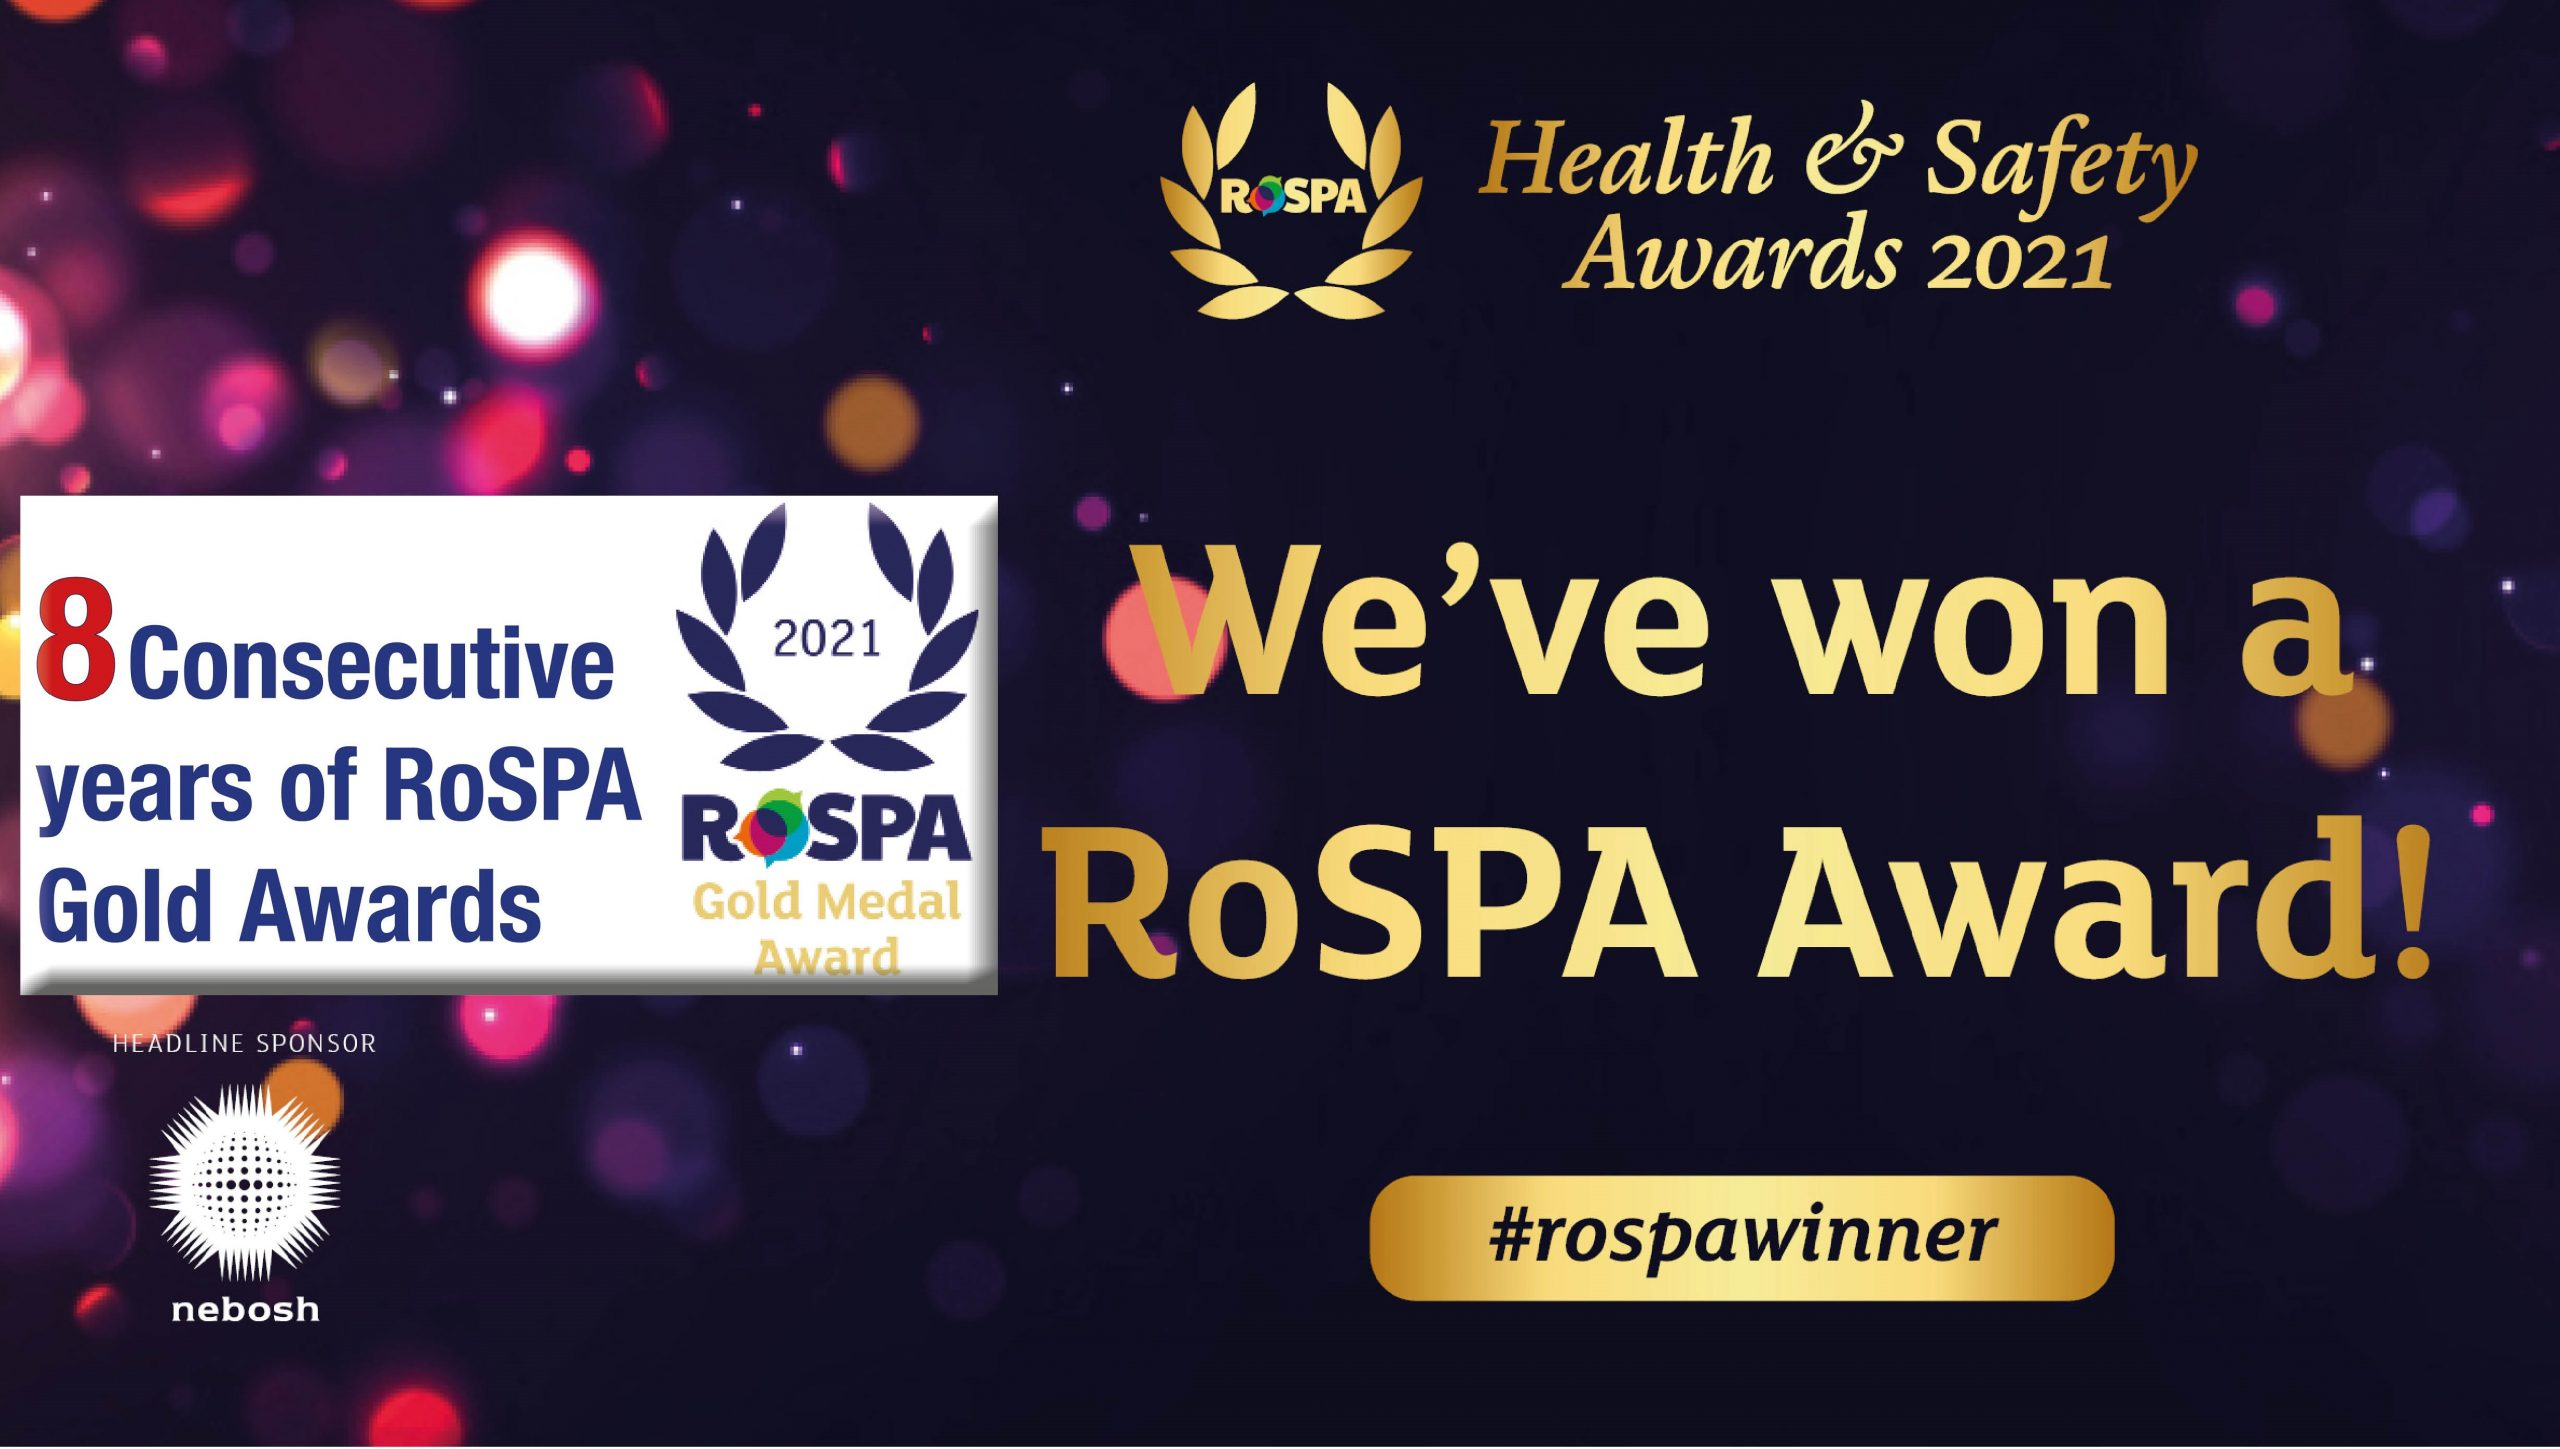 O'Brien Celebrates 8th RoSPA Gold Award and Our 4th Gold Medal Award